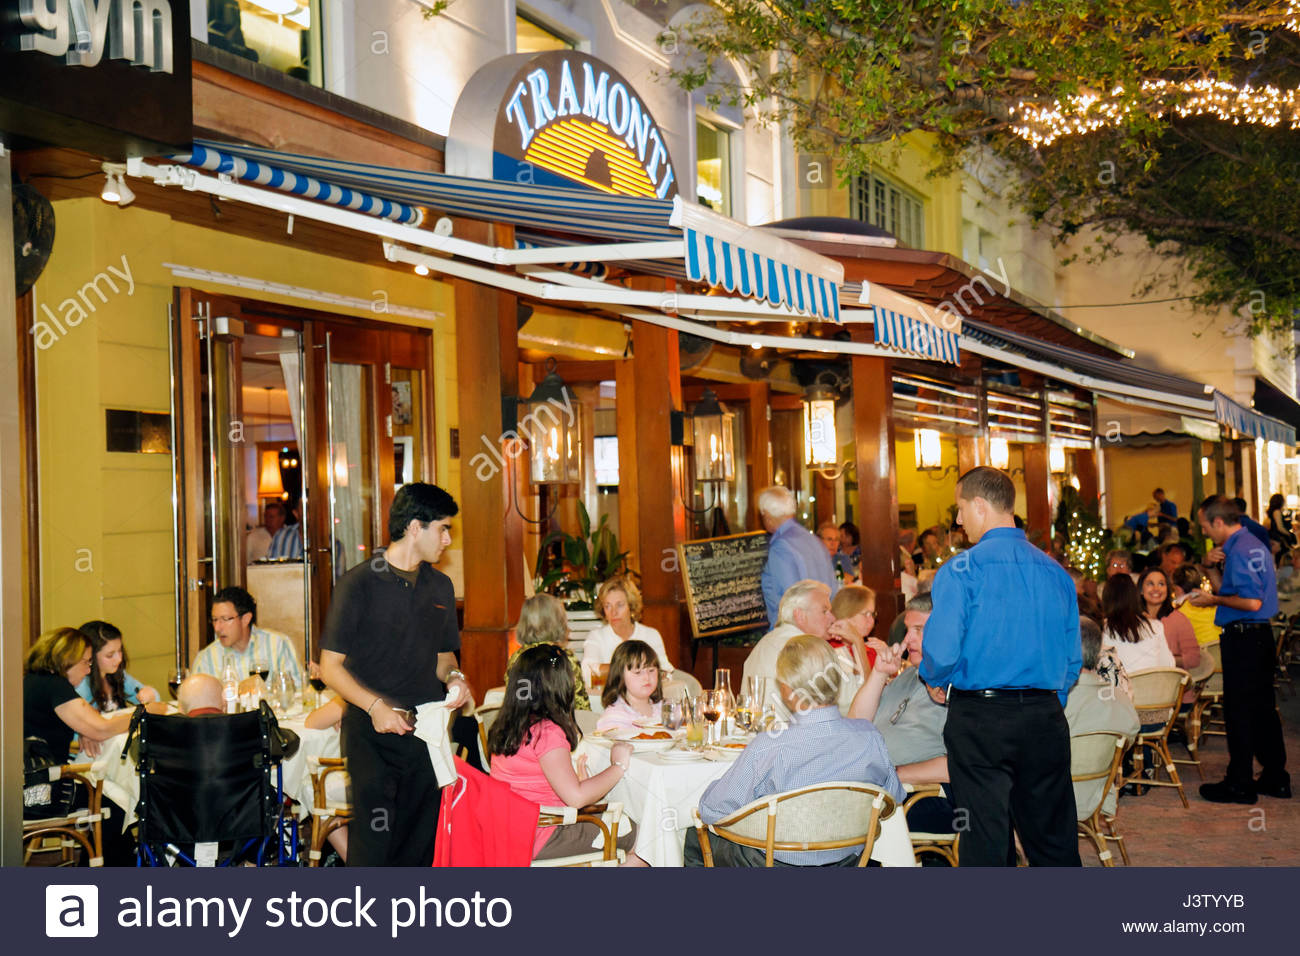 F Floride Delray Beach Atlantic Avenue Restaurant Row Tramonti à 119 entreprises italiennes dîner à Photo Stock